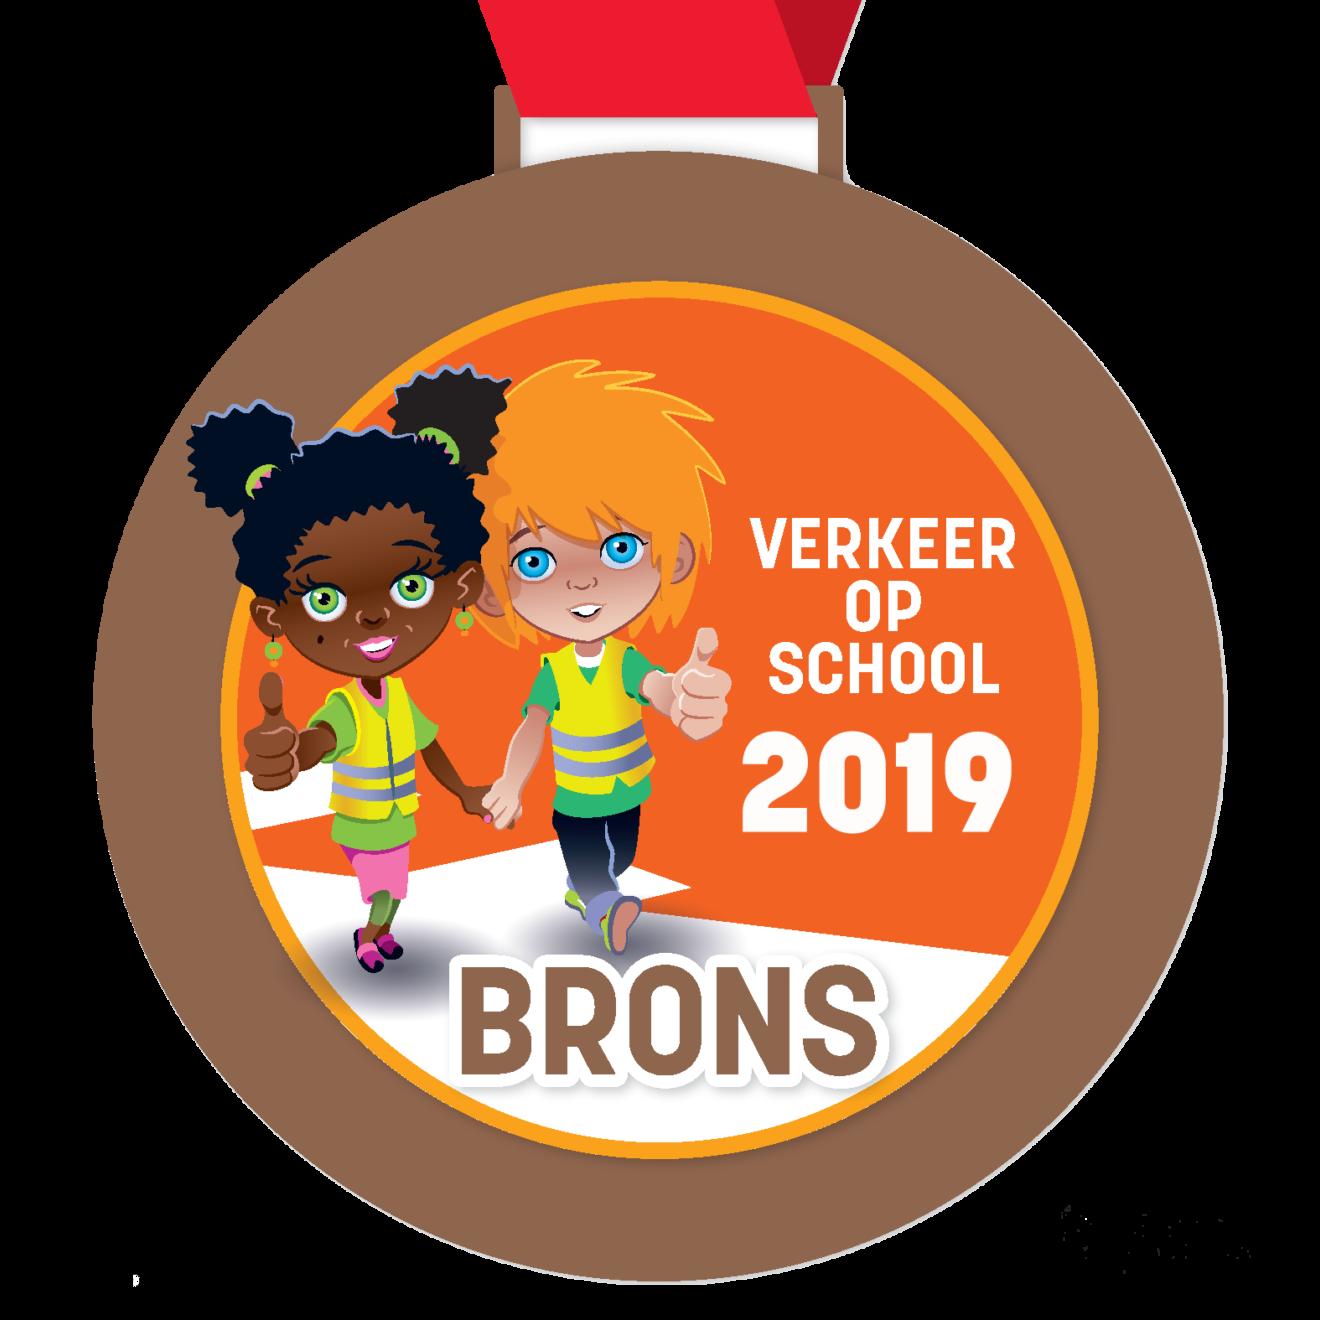 Bronzen medaille